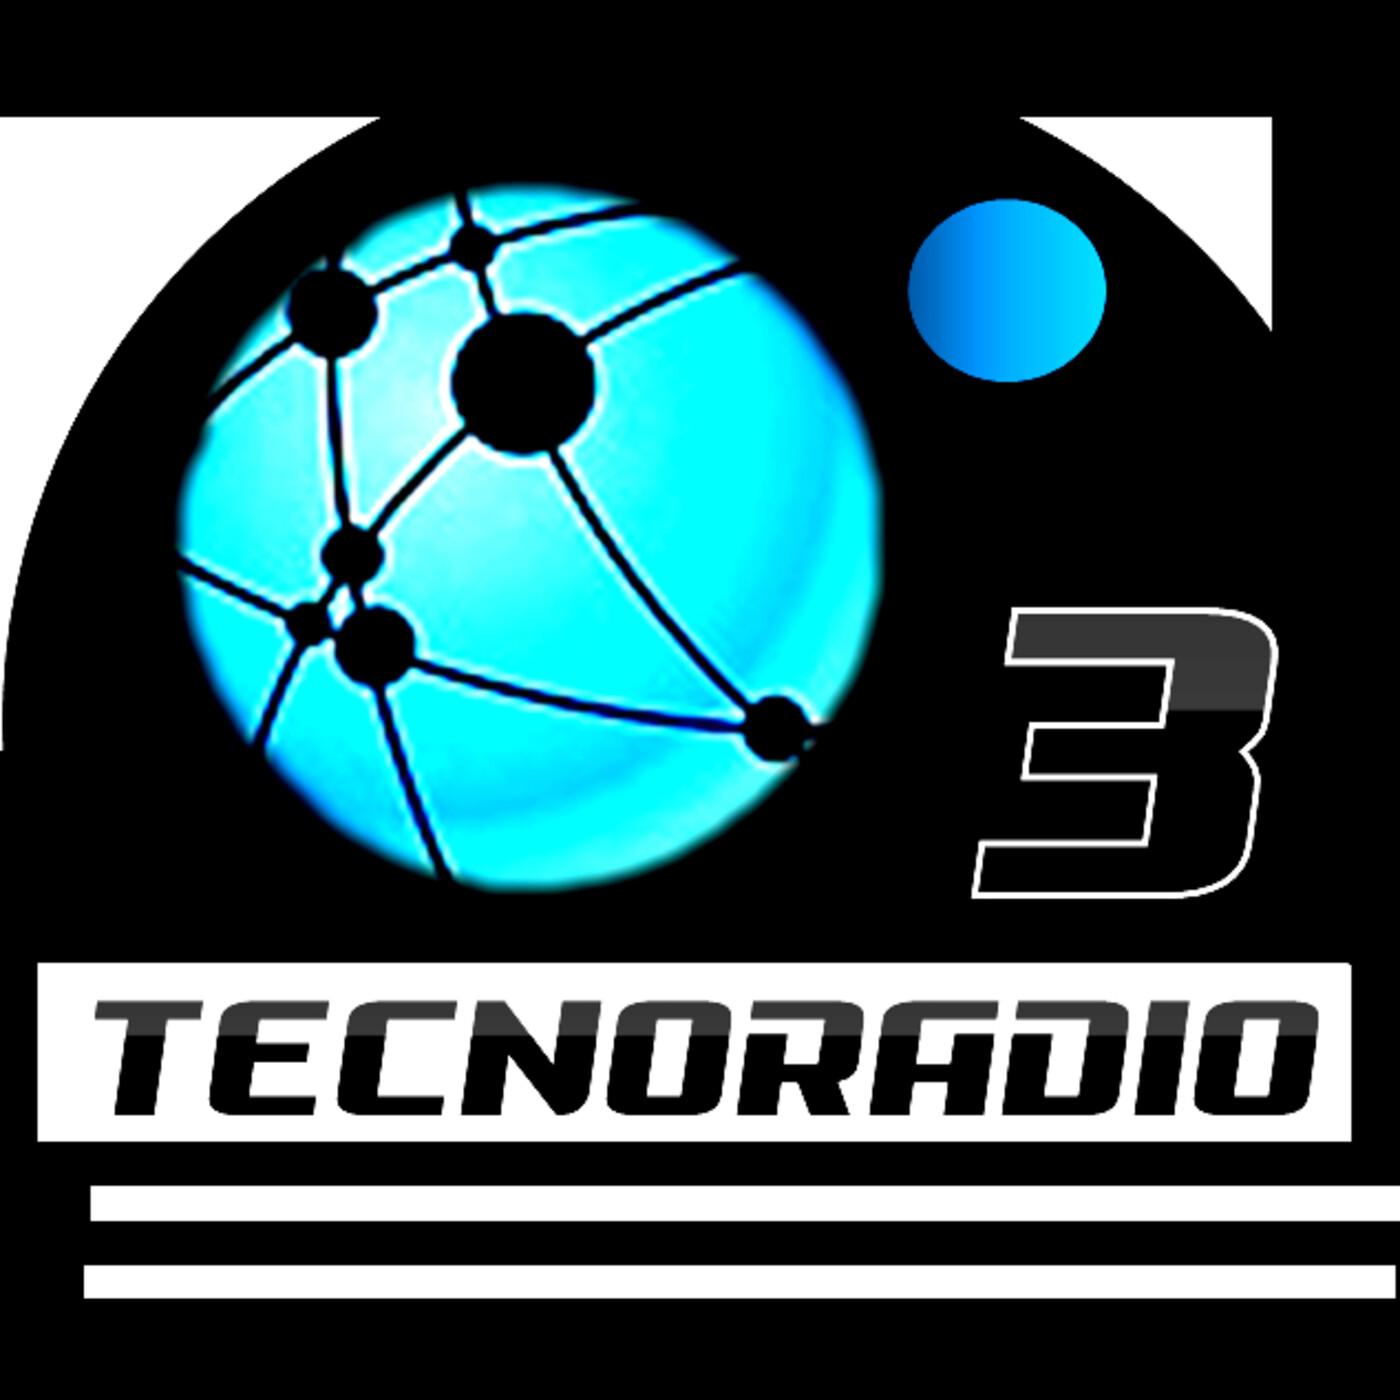 TECNOradio 3